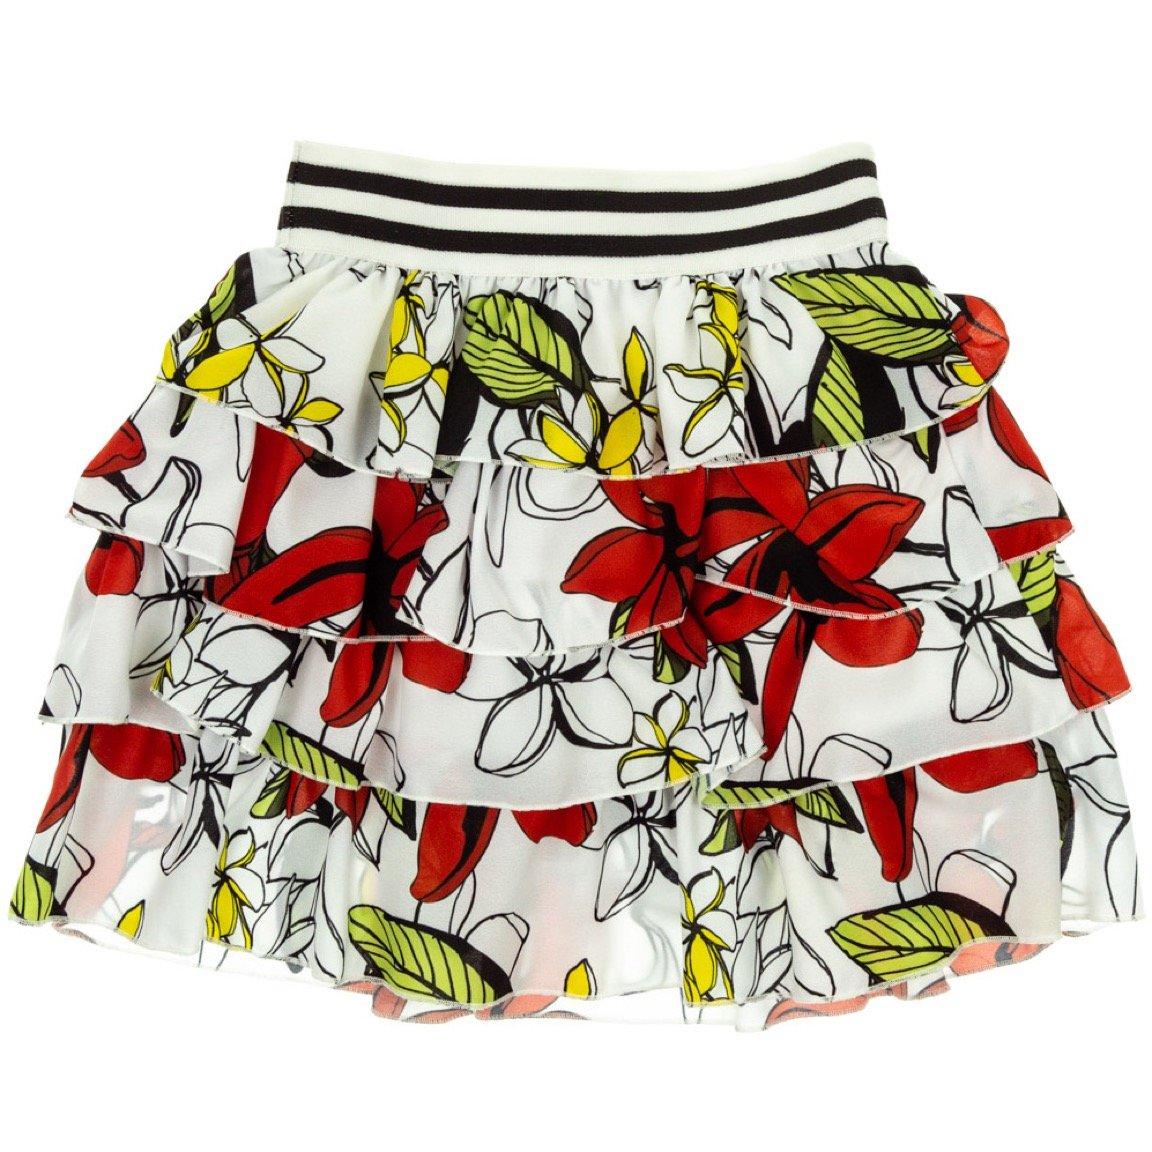 Dafny παιδική φούστα «Summer Flowers»